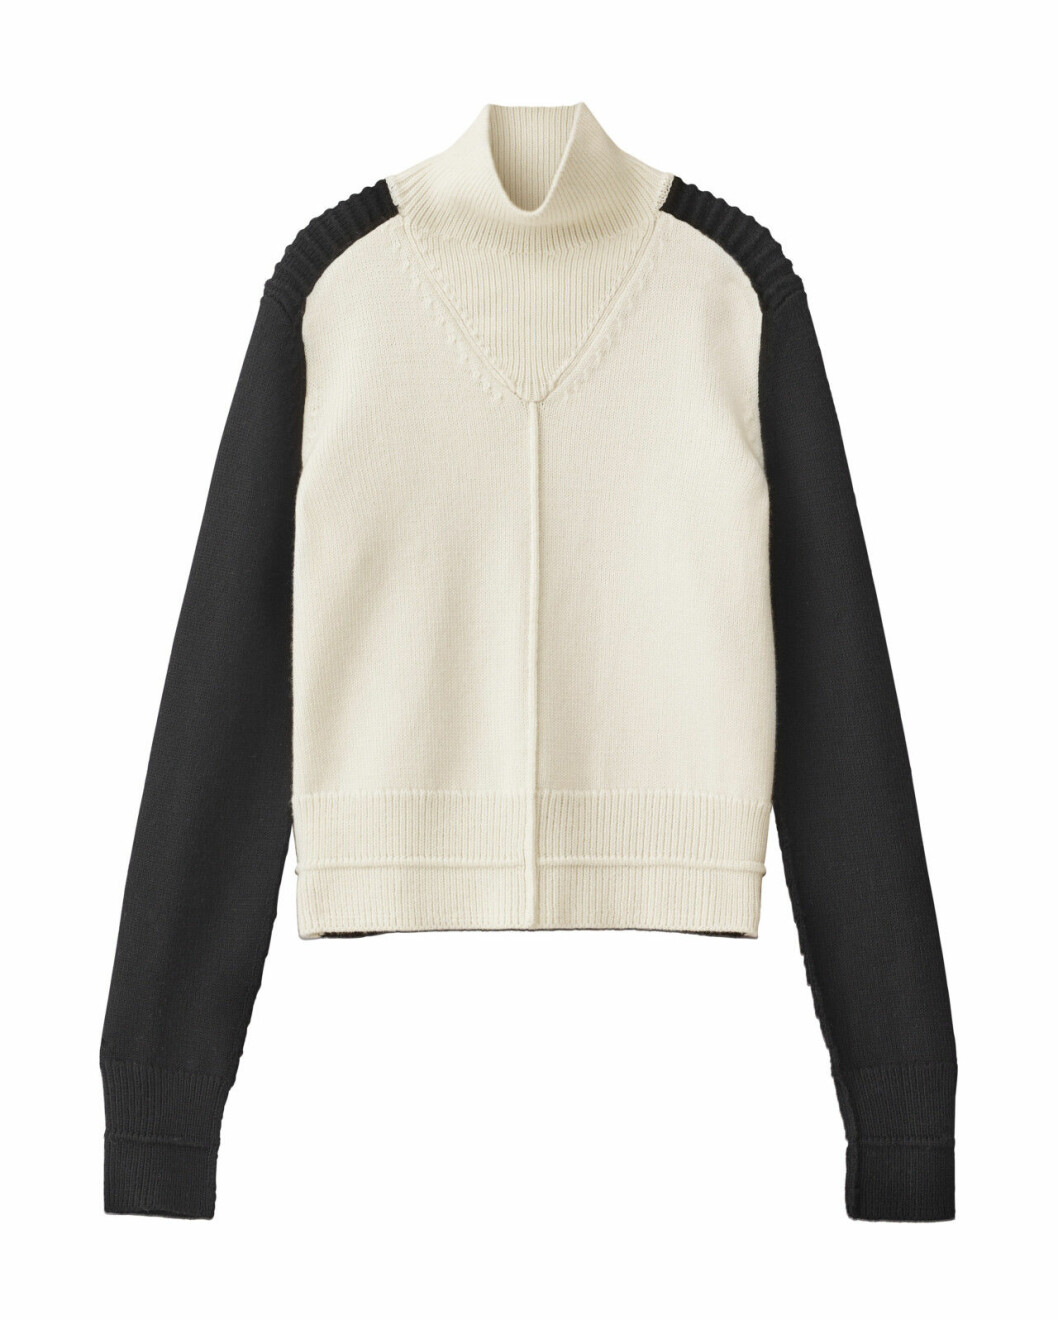 H&M Studio höstkollektion aw 2019 – svartvit polotröja